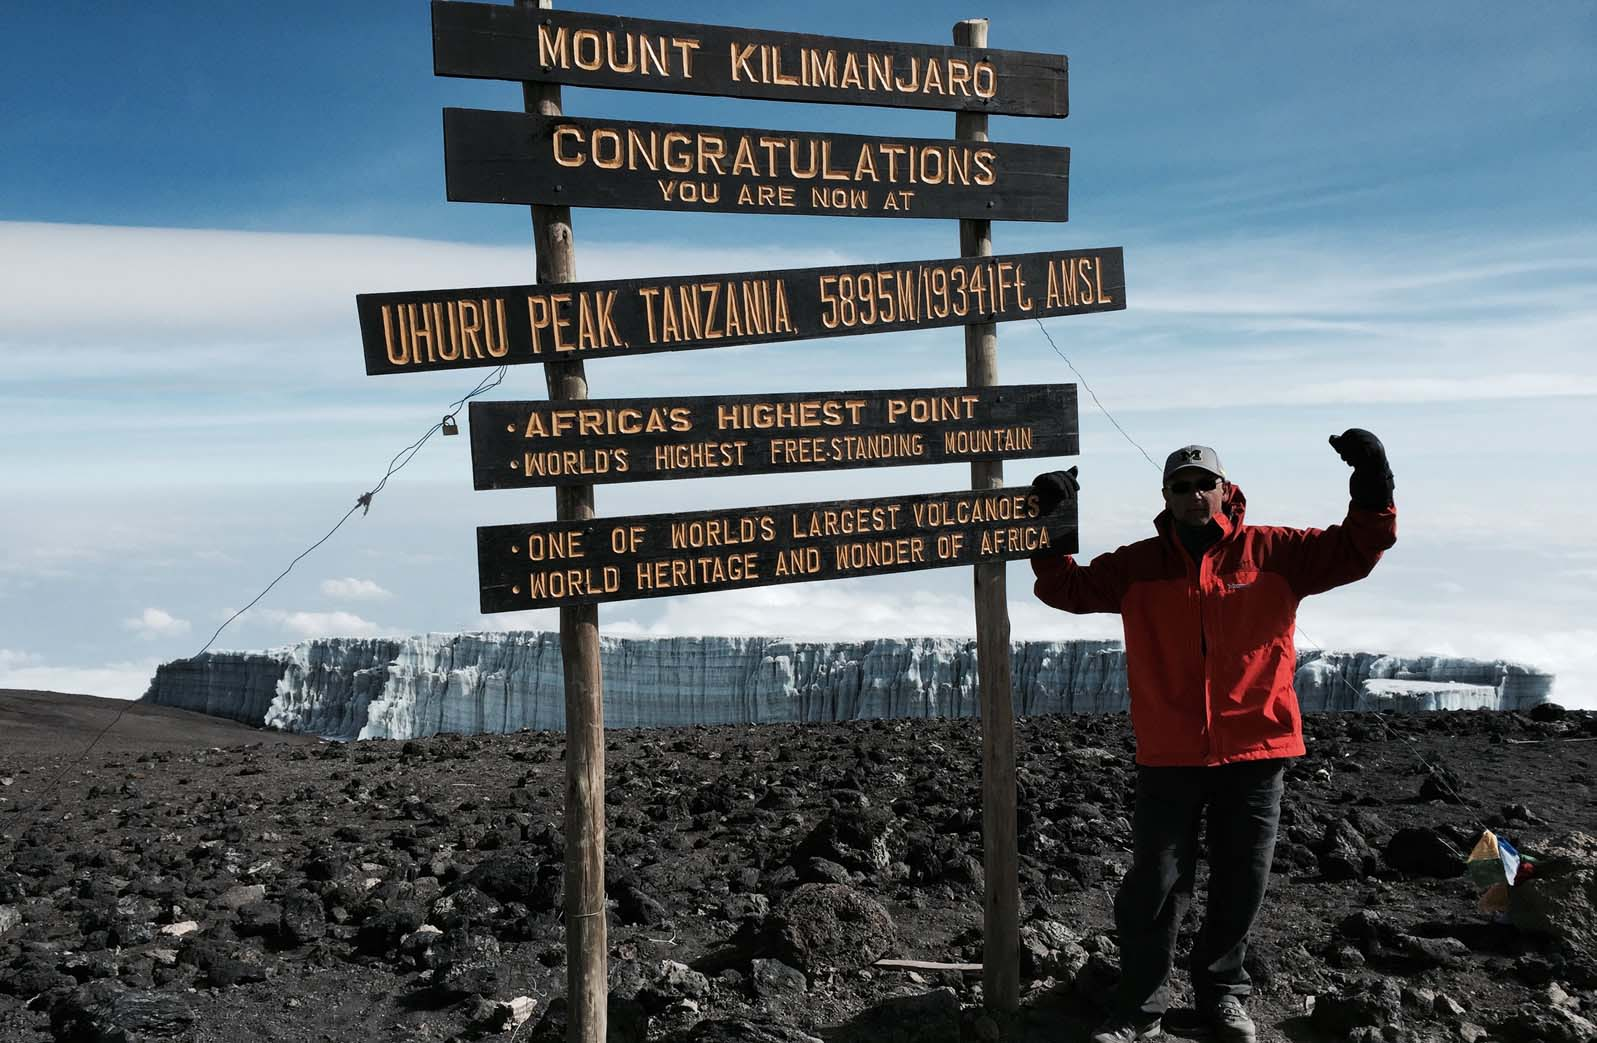 Advanced prostate cancer didn't stop John Loussia from climbing Mt. Kilimanjaro